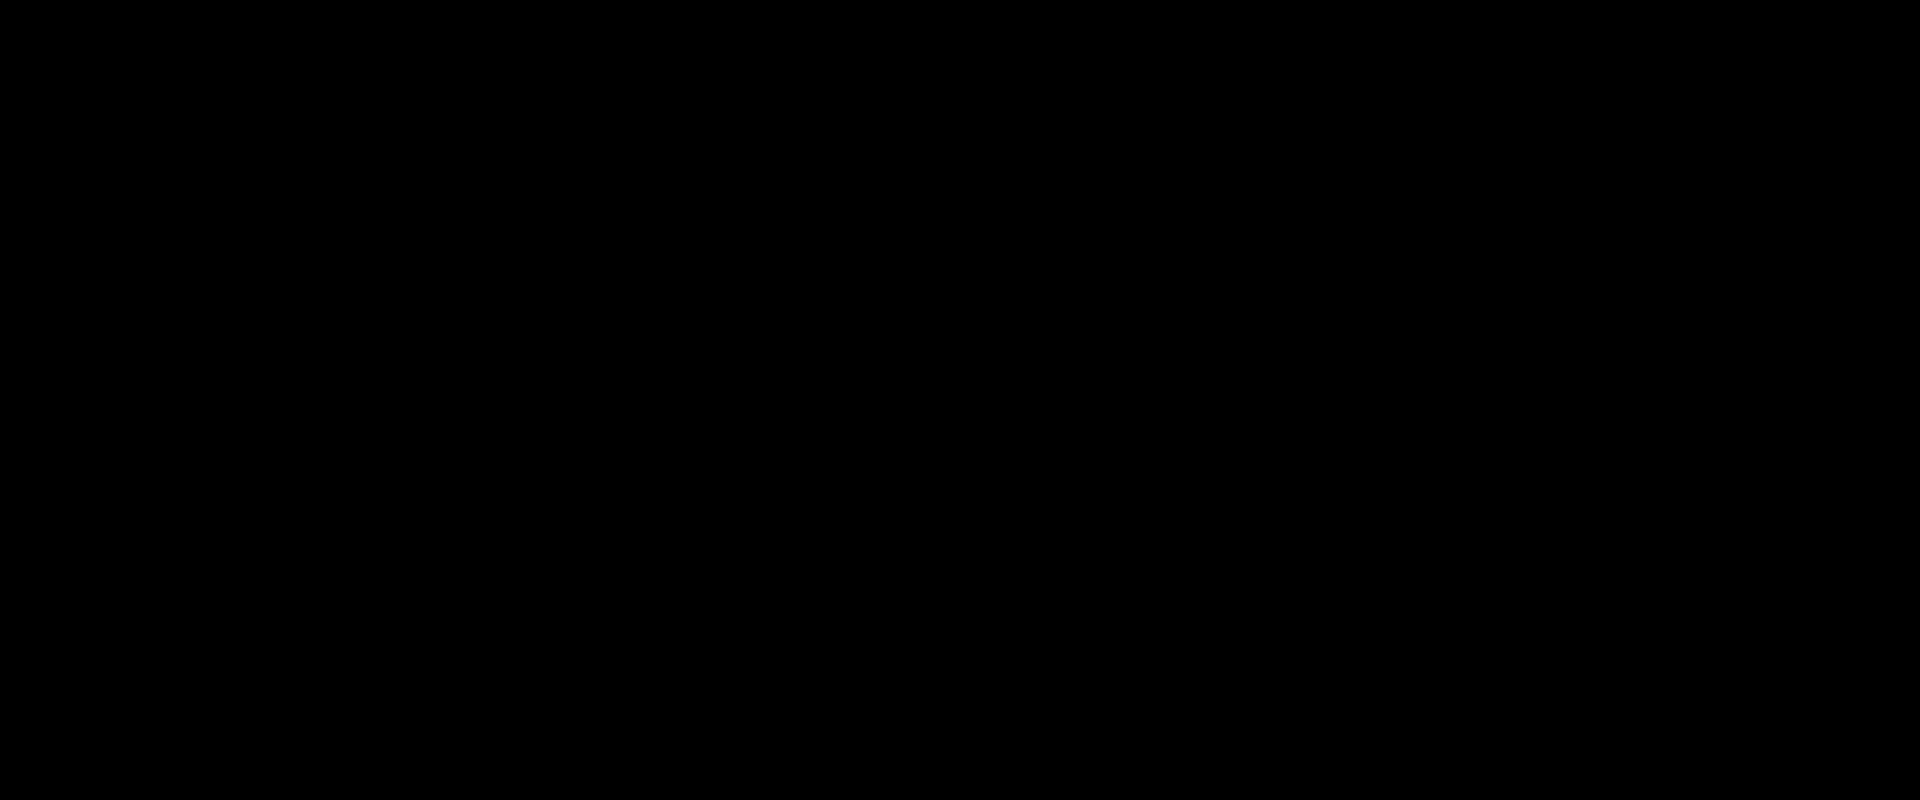 banner-SOMOS-LUZ-fondo